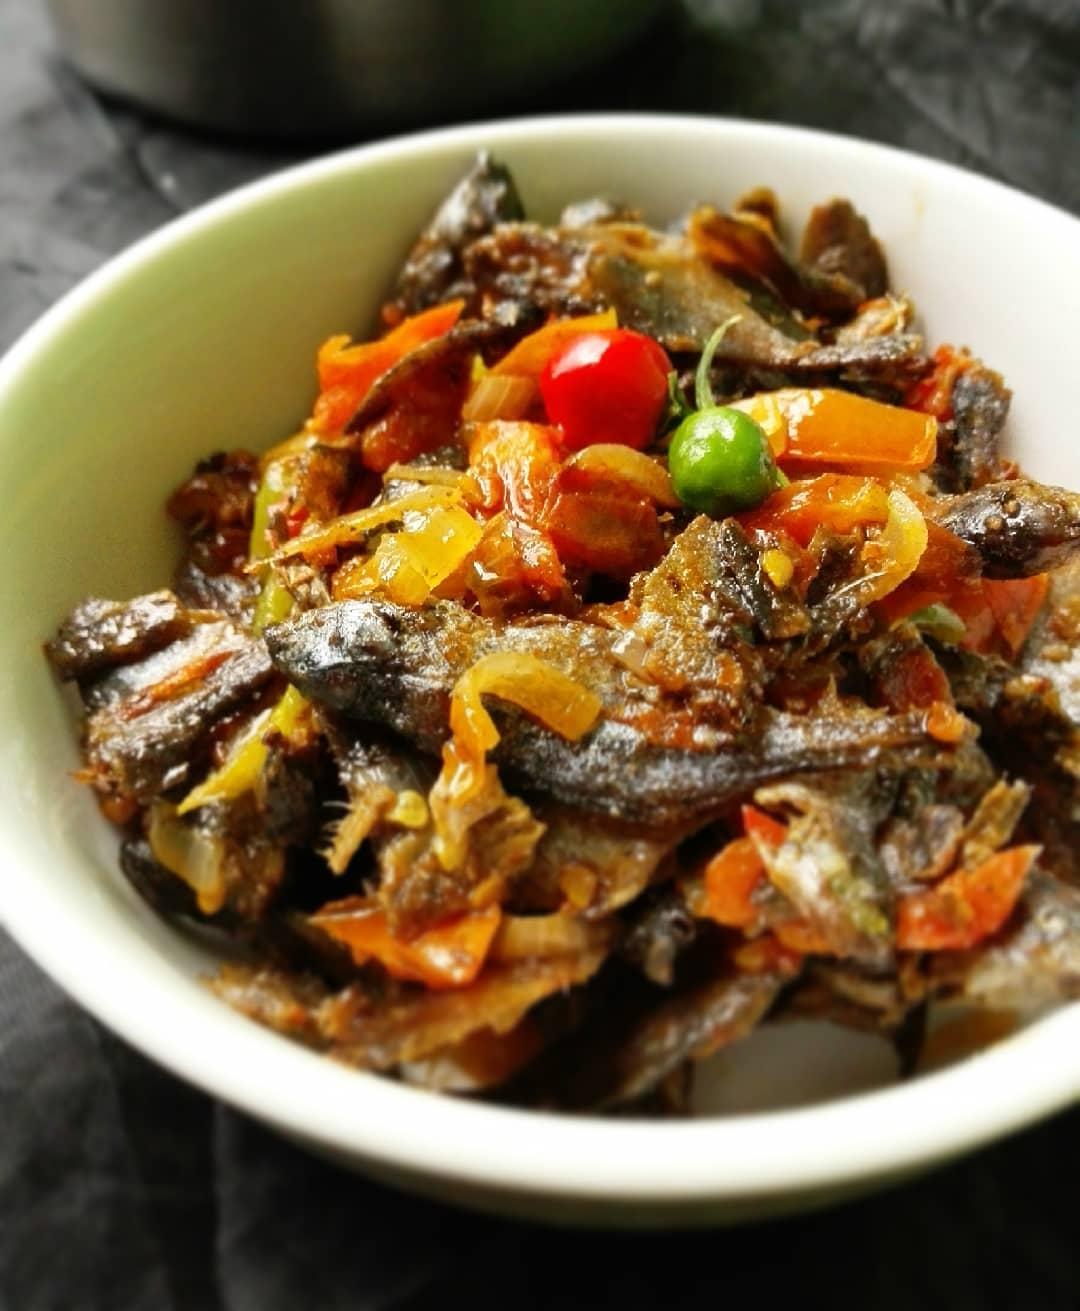 Dried Imintesa in Gravy-Zambian Food